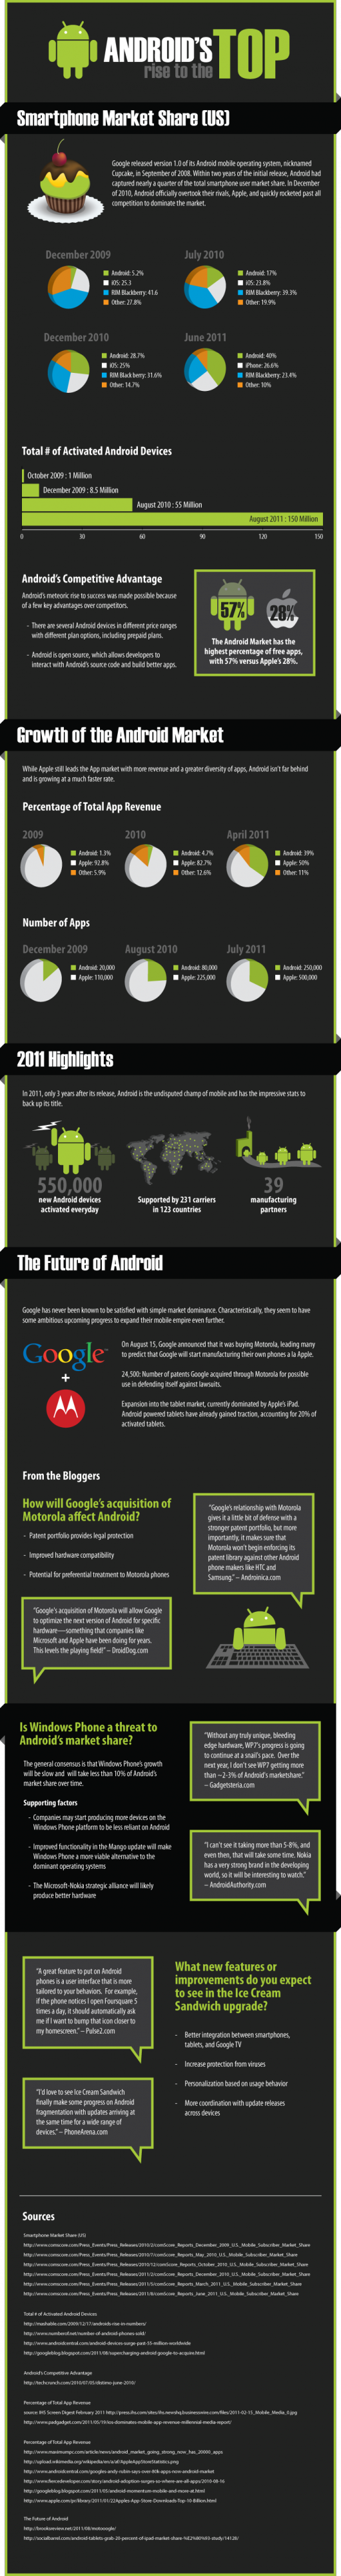 Android наступает, Apple волнуется